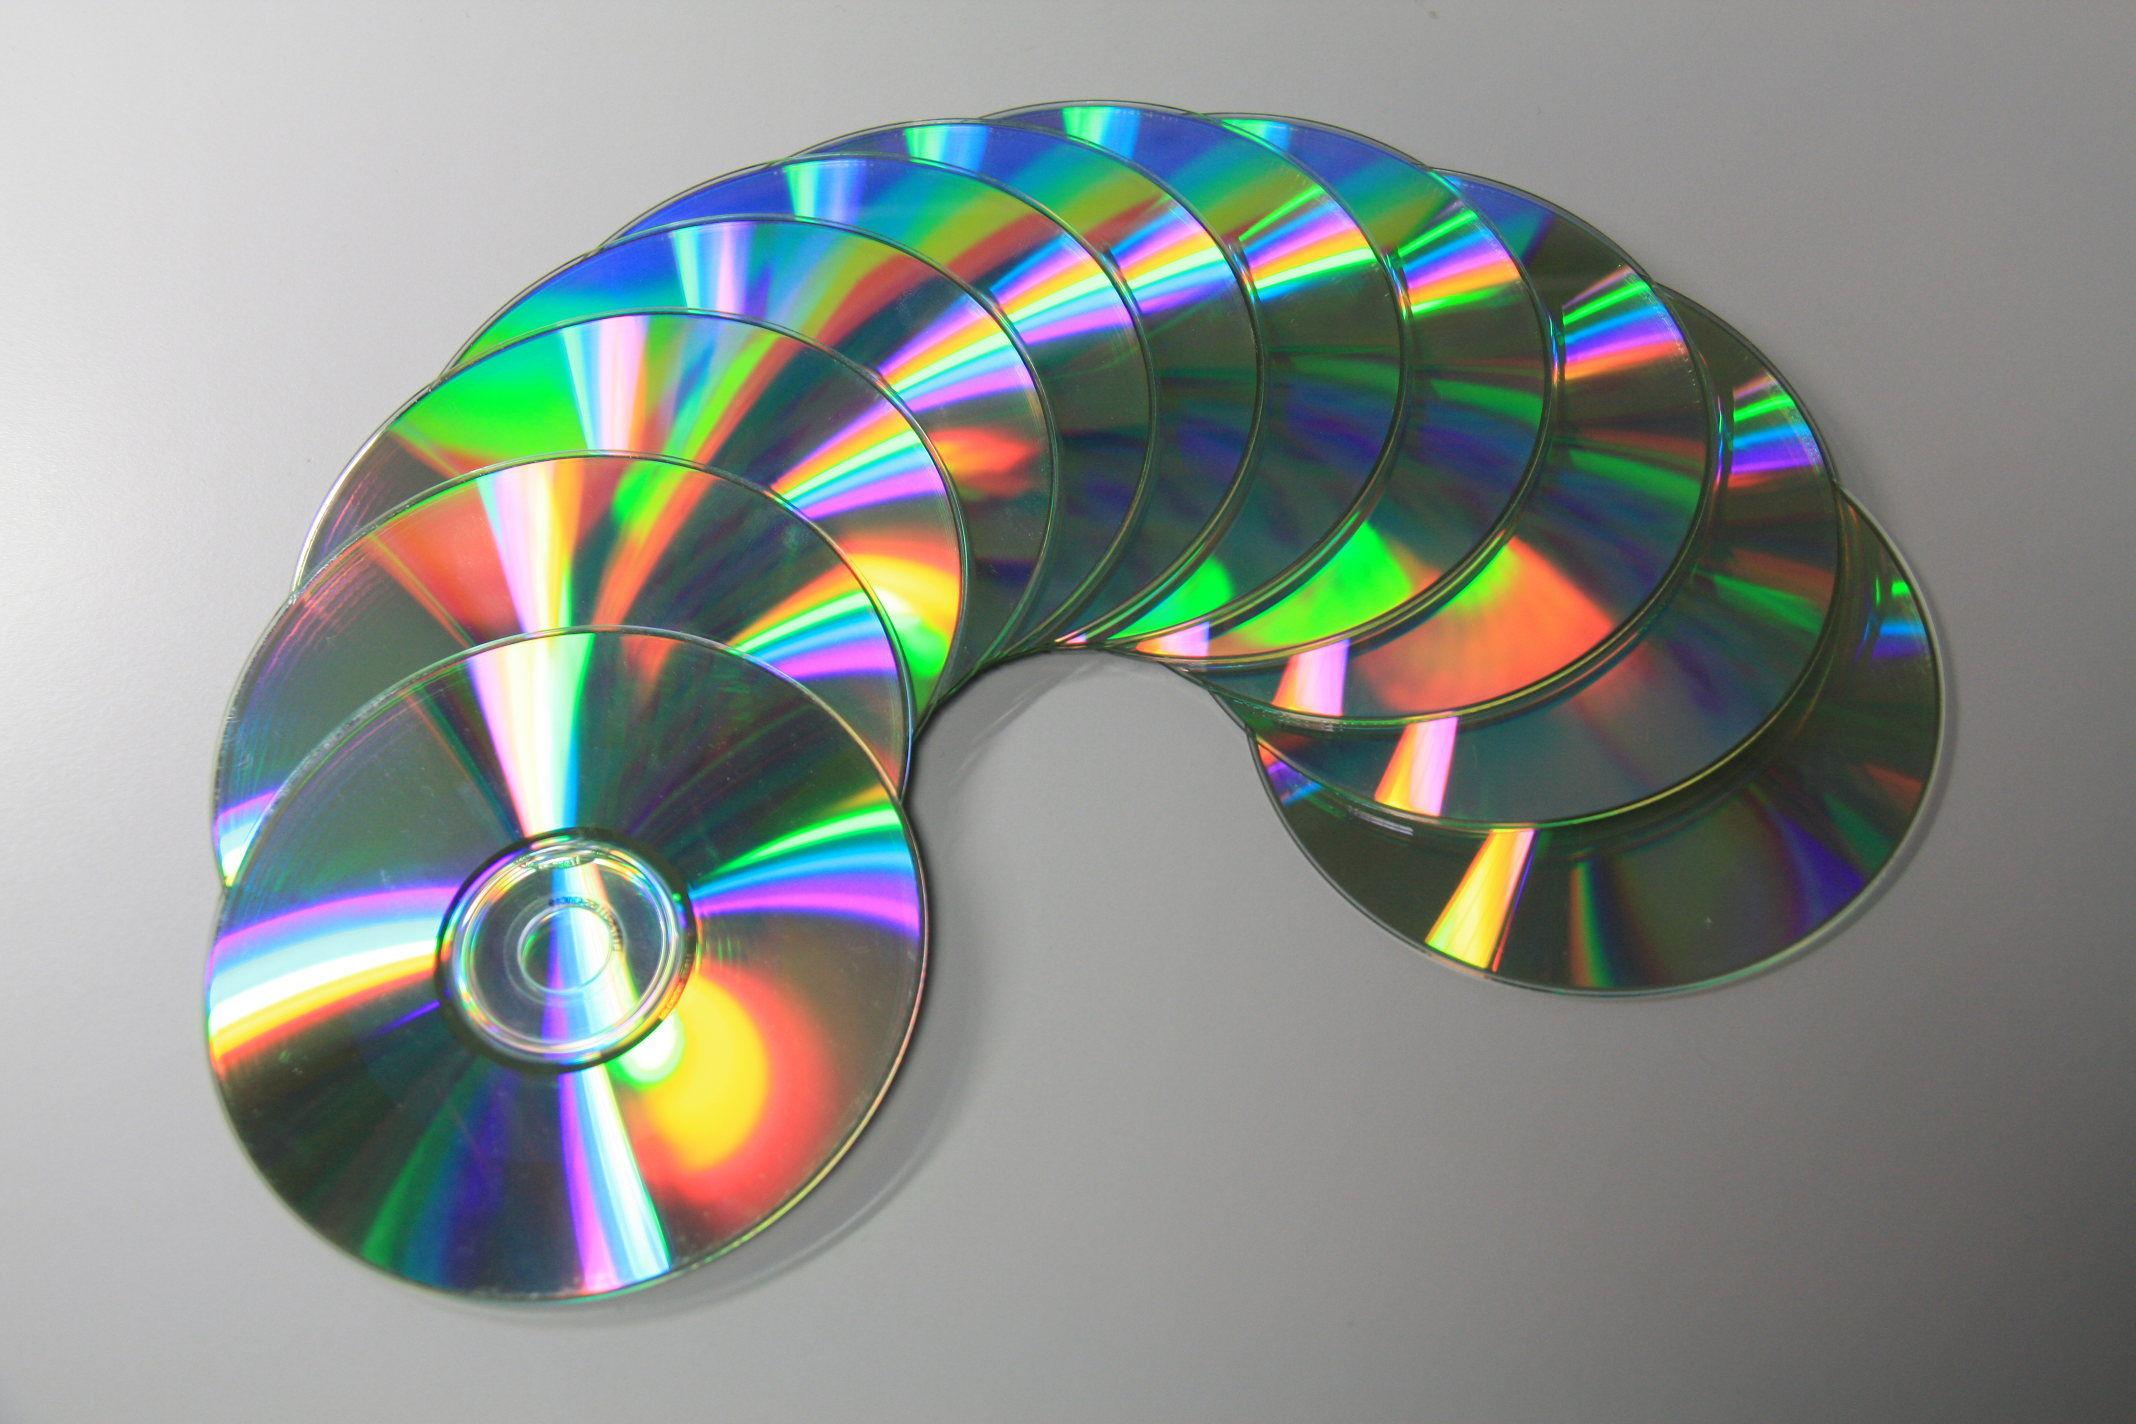 ¿Cuáles de estas compañías se asociaron con Nintendo para crear un accesorio para SNES que permitía leer CD?